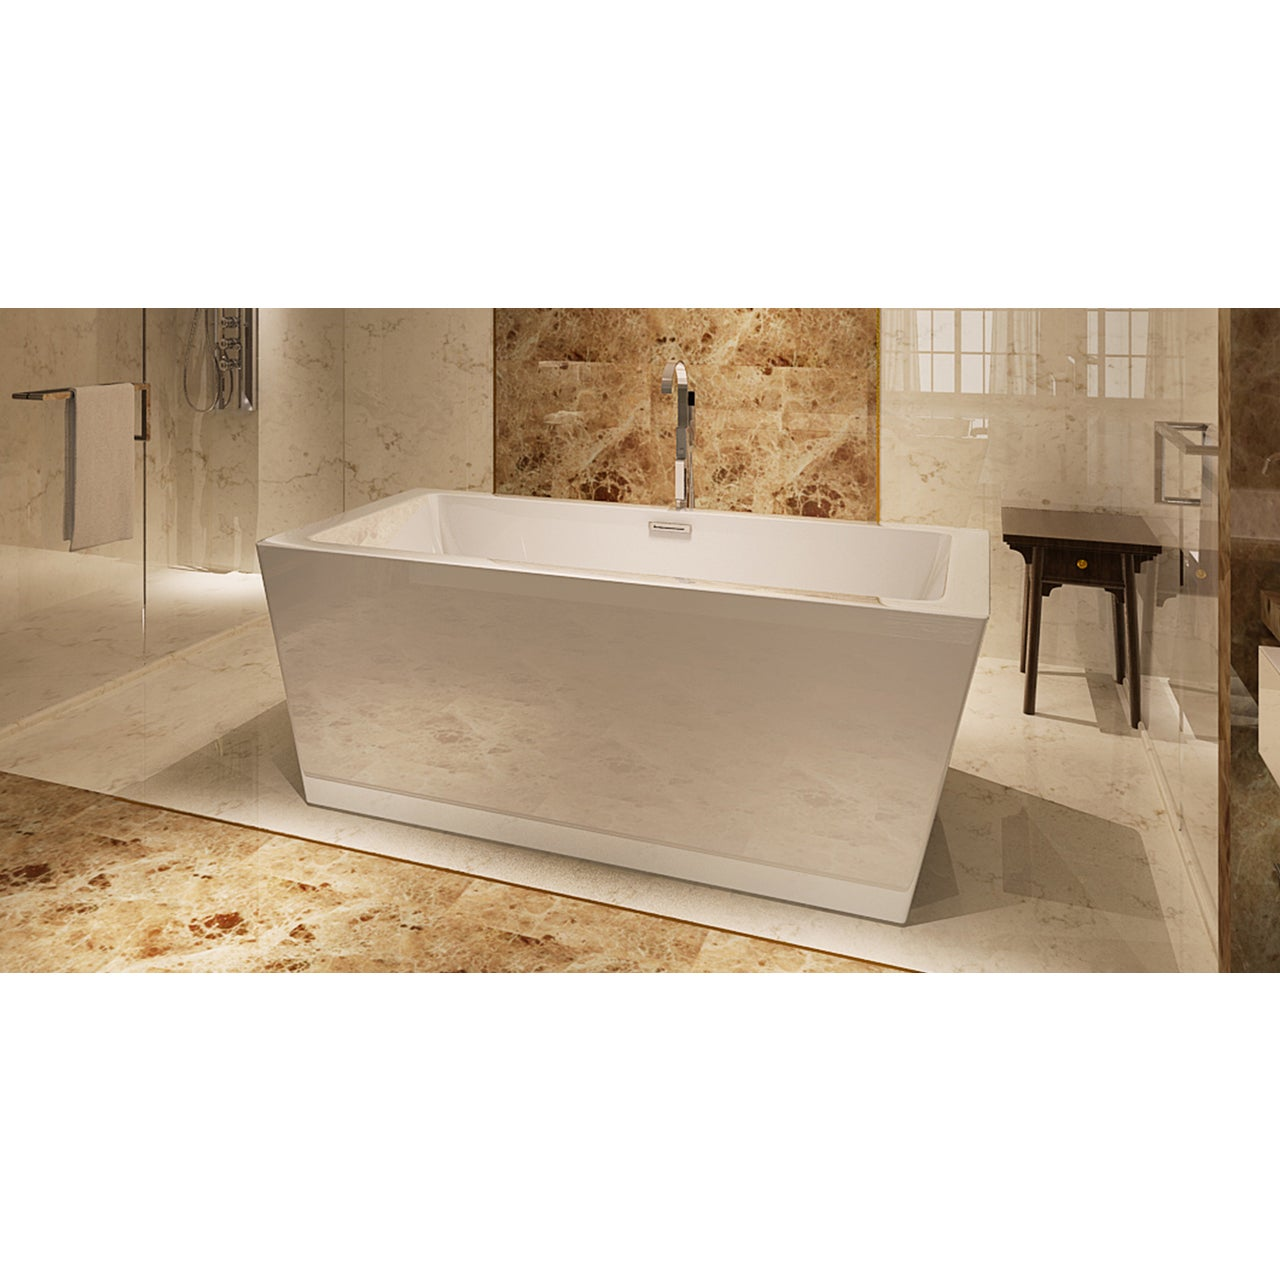 HelixBath Centaur Freestanding White Acrylic 67-inch Bath...